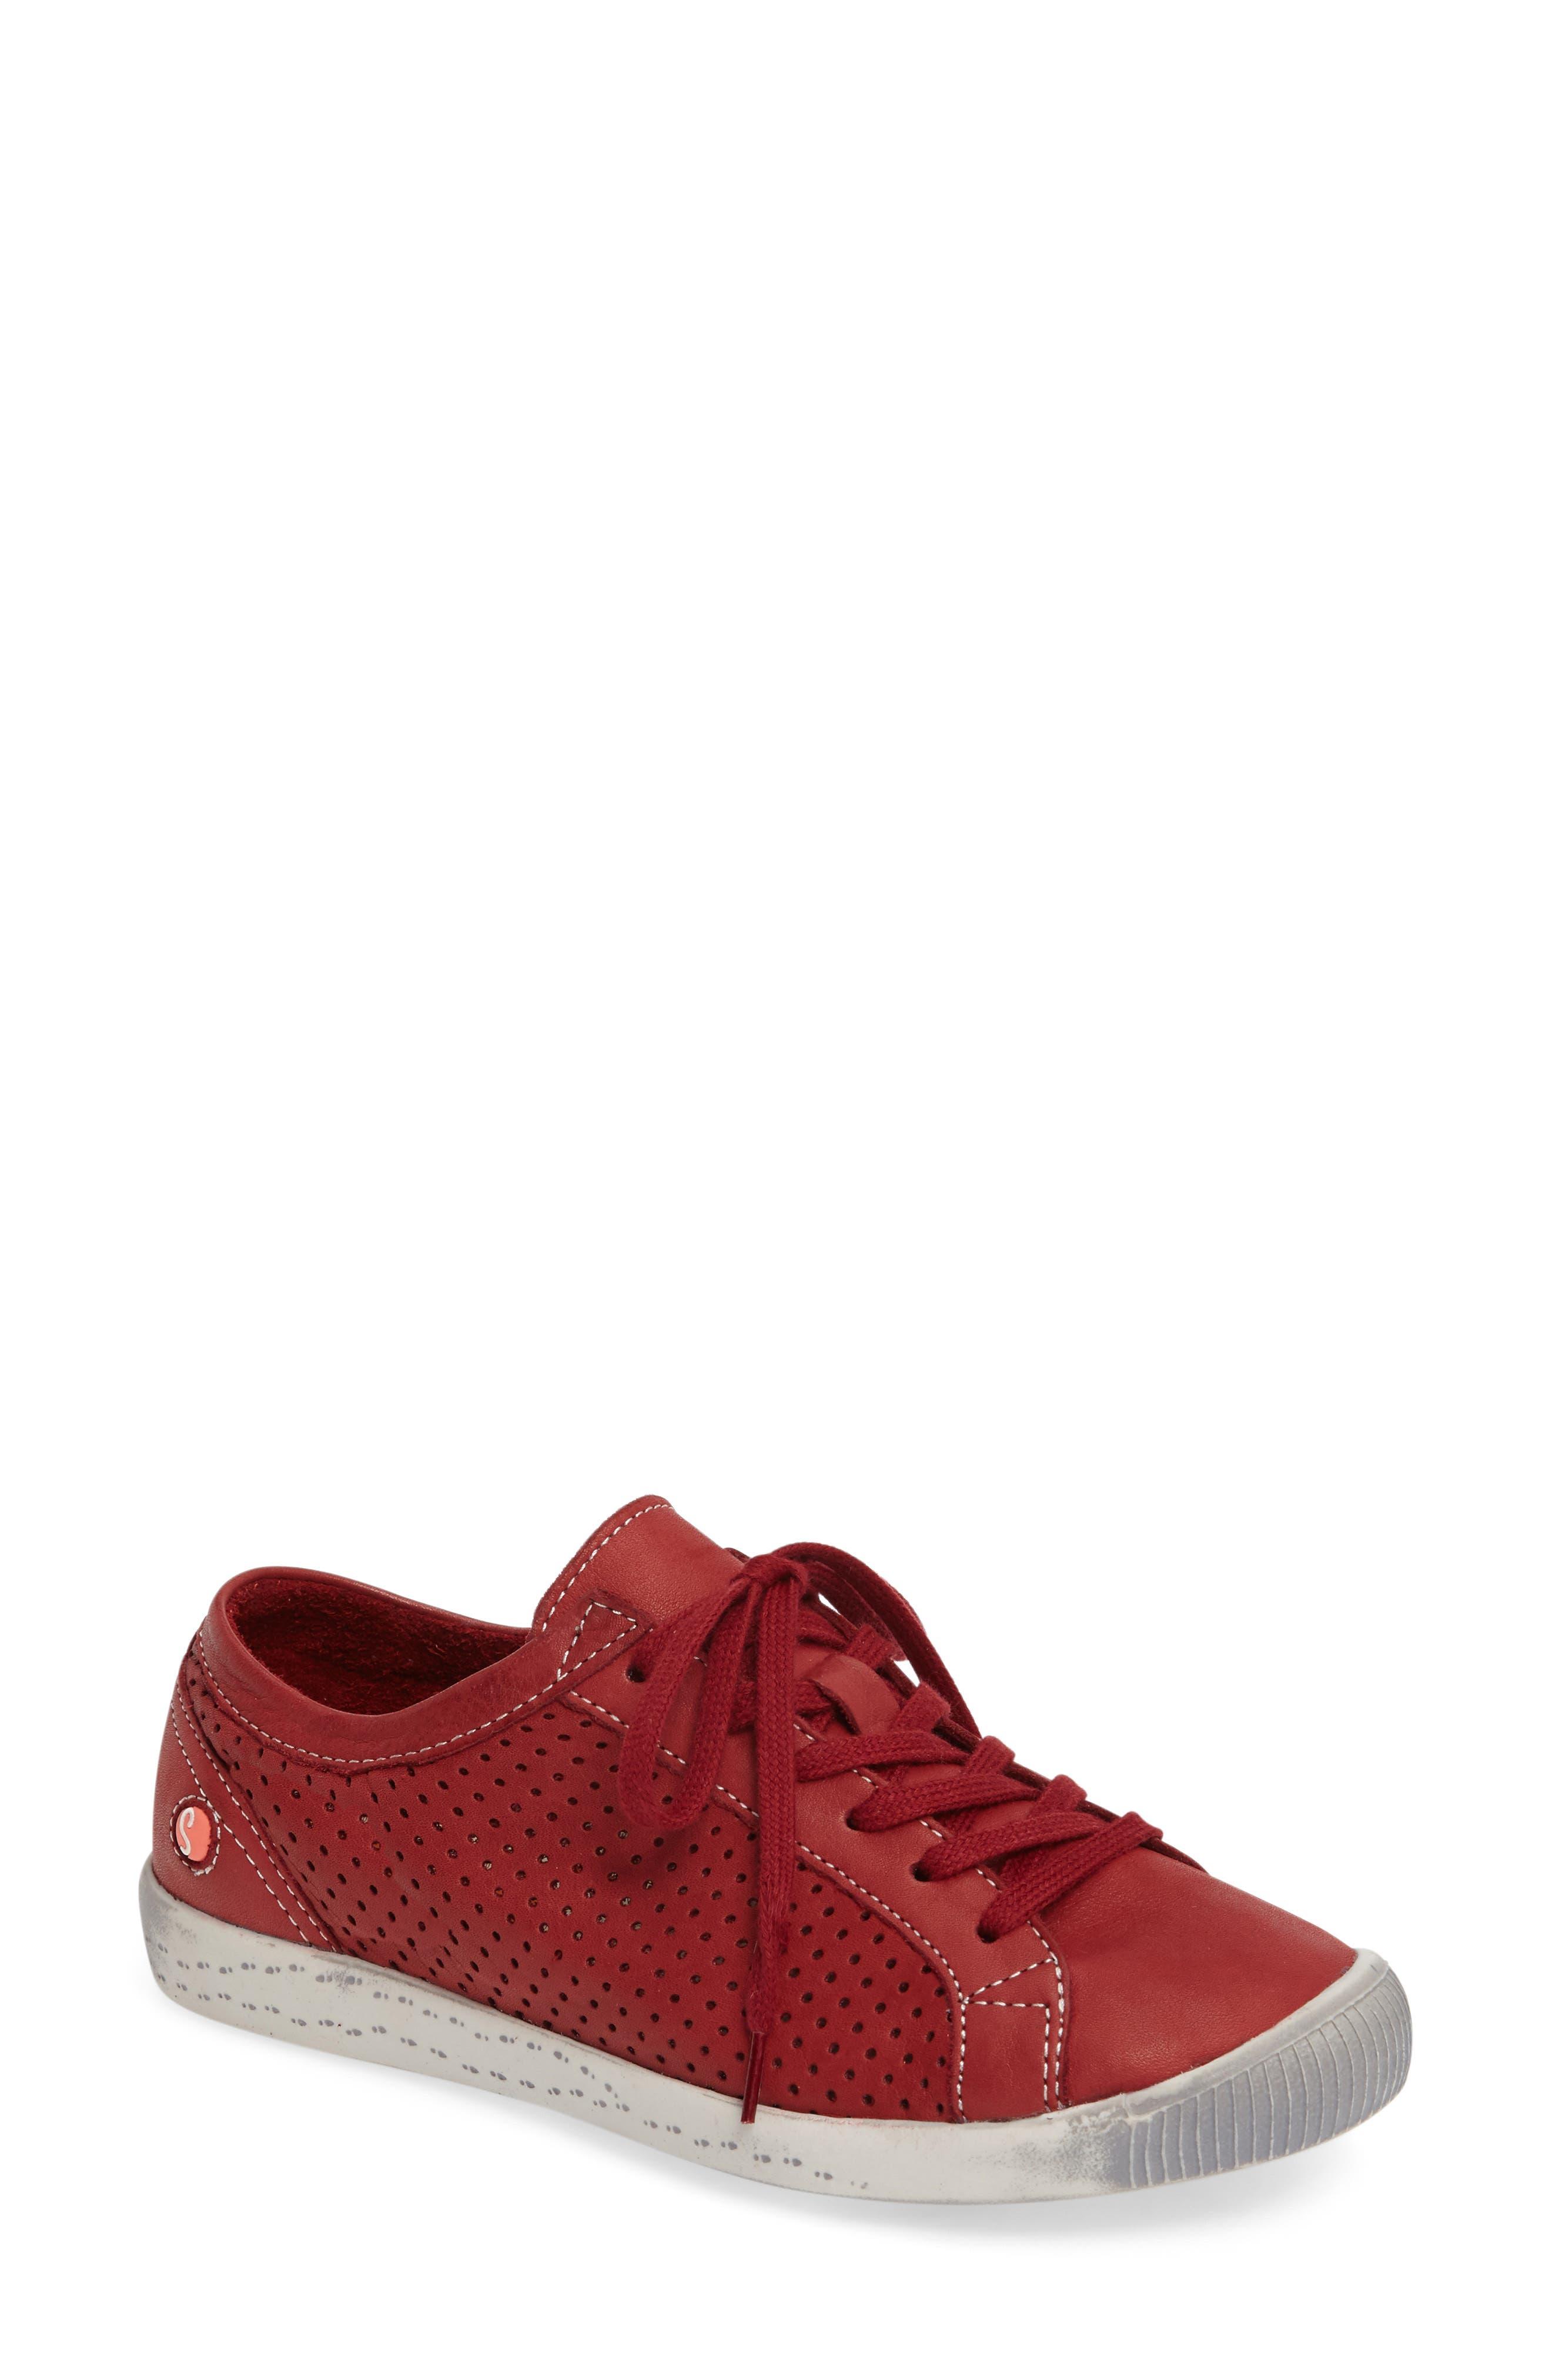 Ica Sneaker,                             Main thumbnail 8, color,